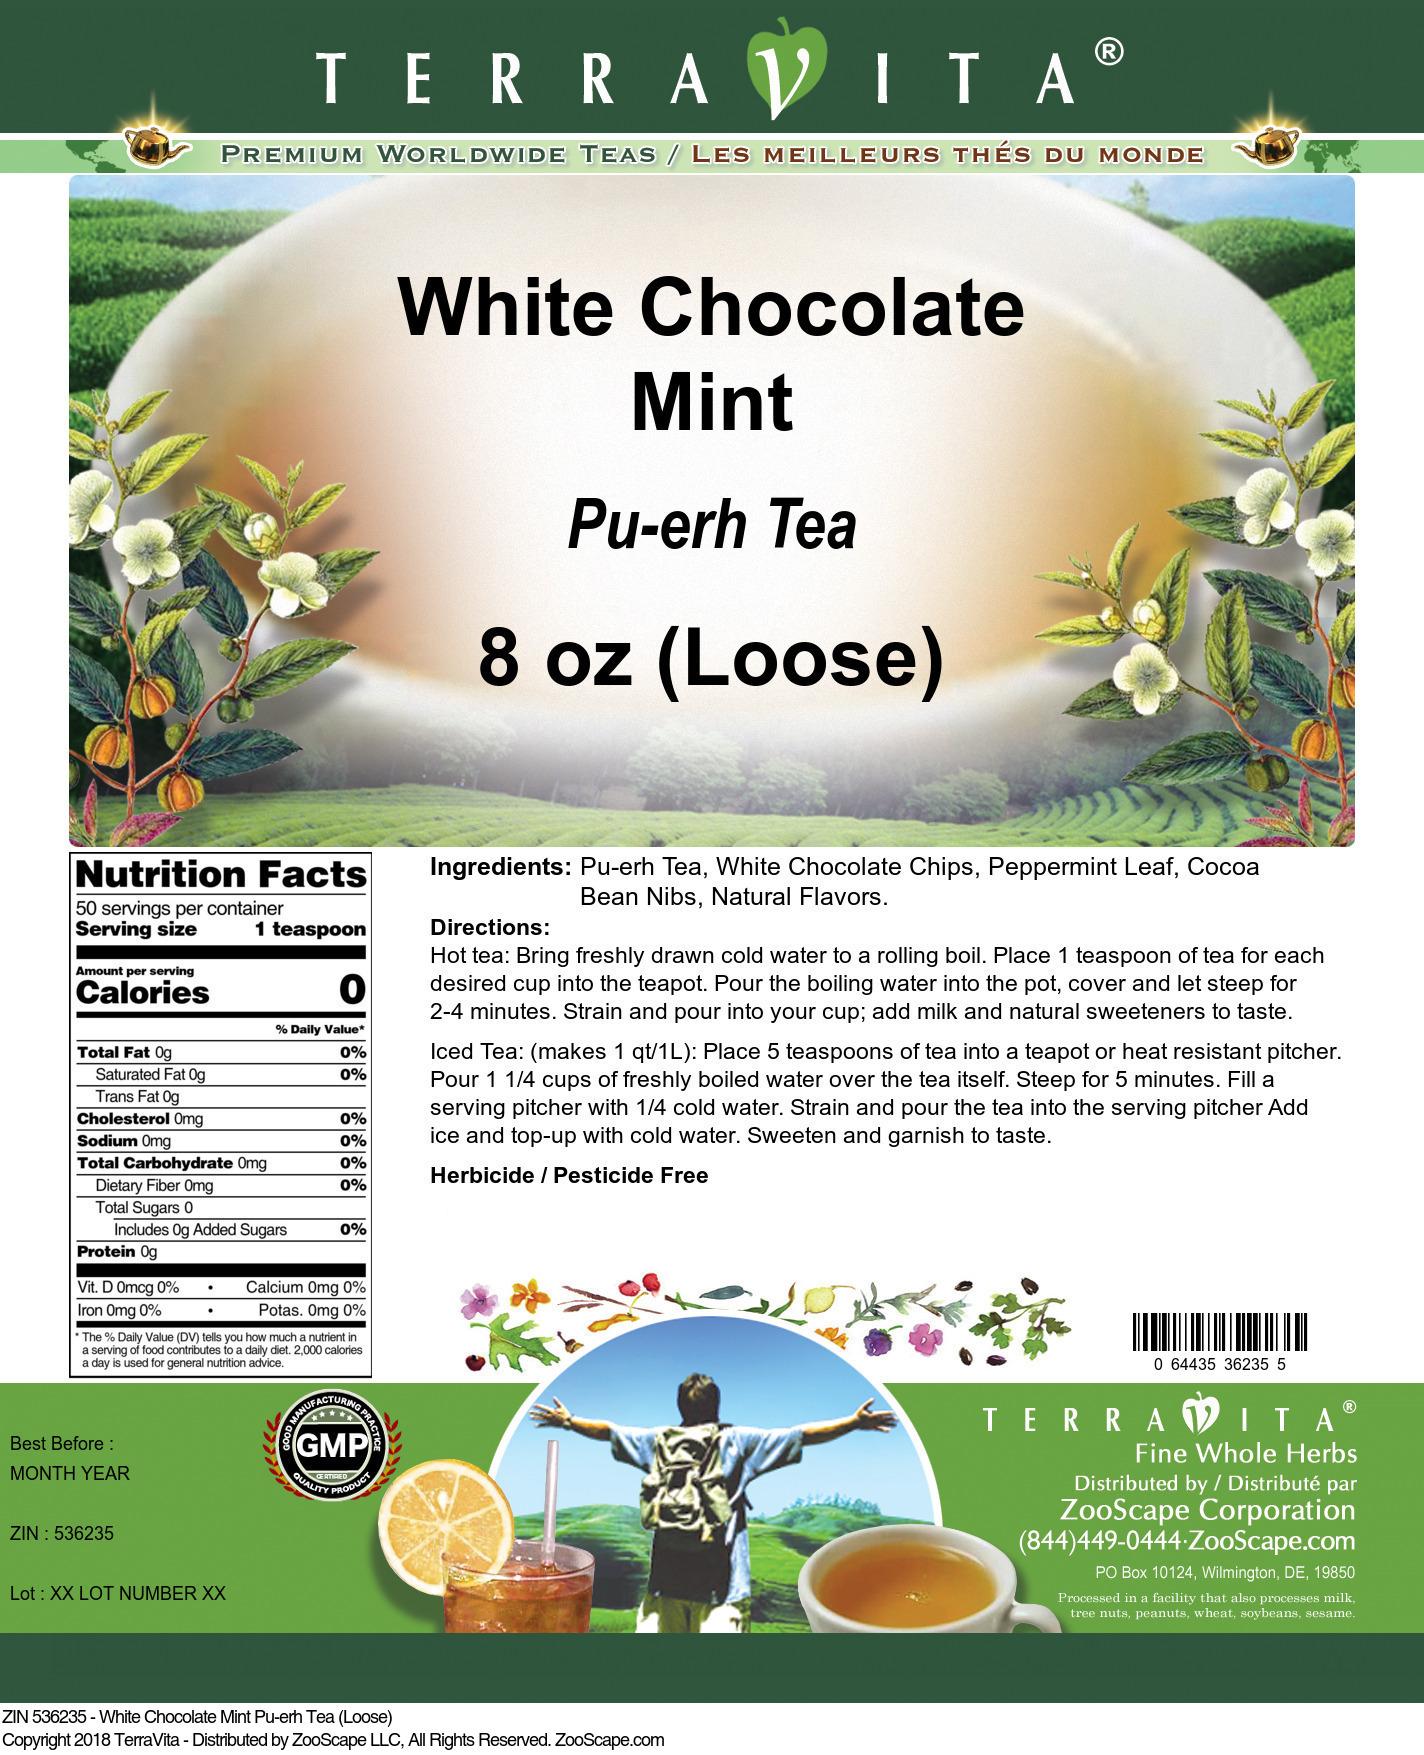 White Chocolate Mint Pu-erh Tea (Loose)